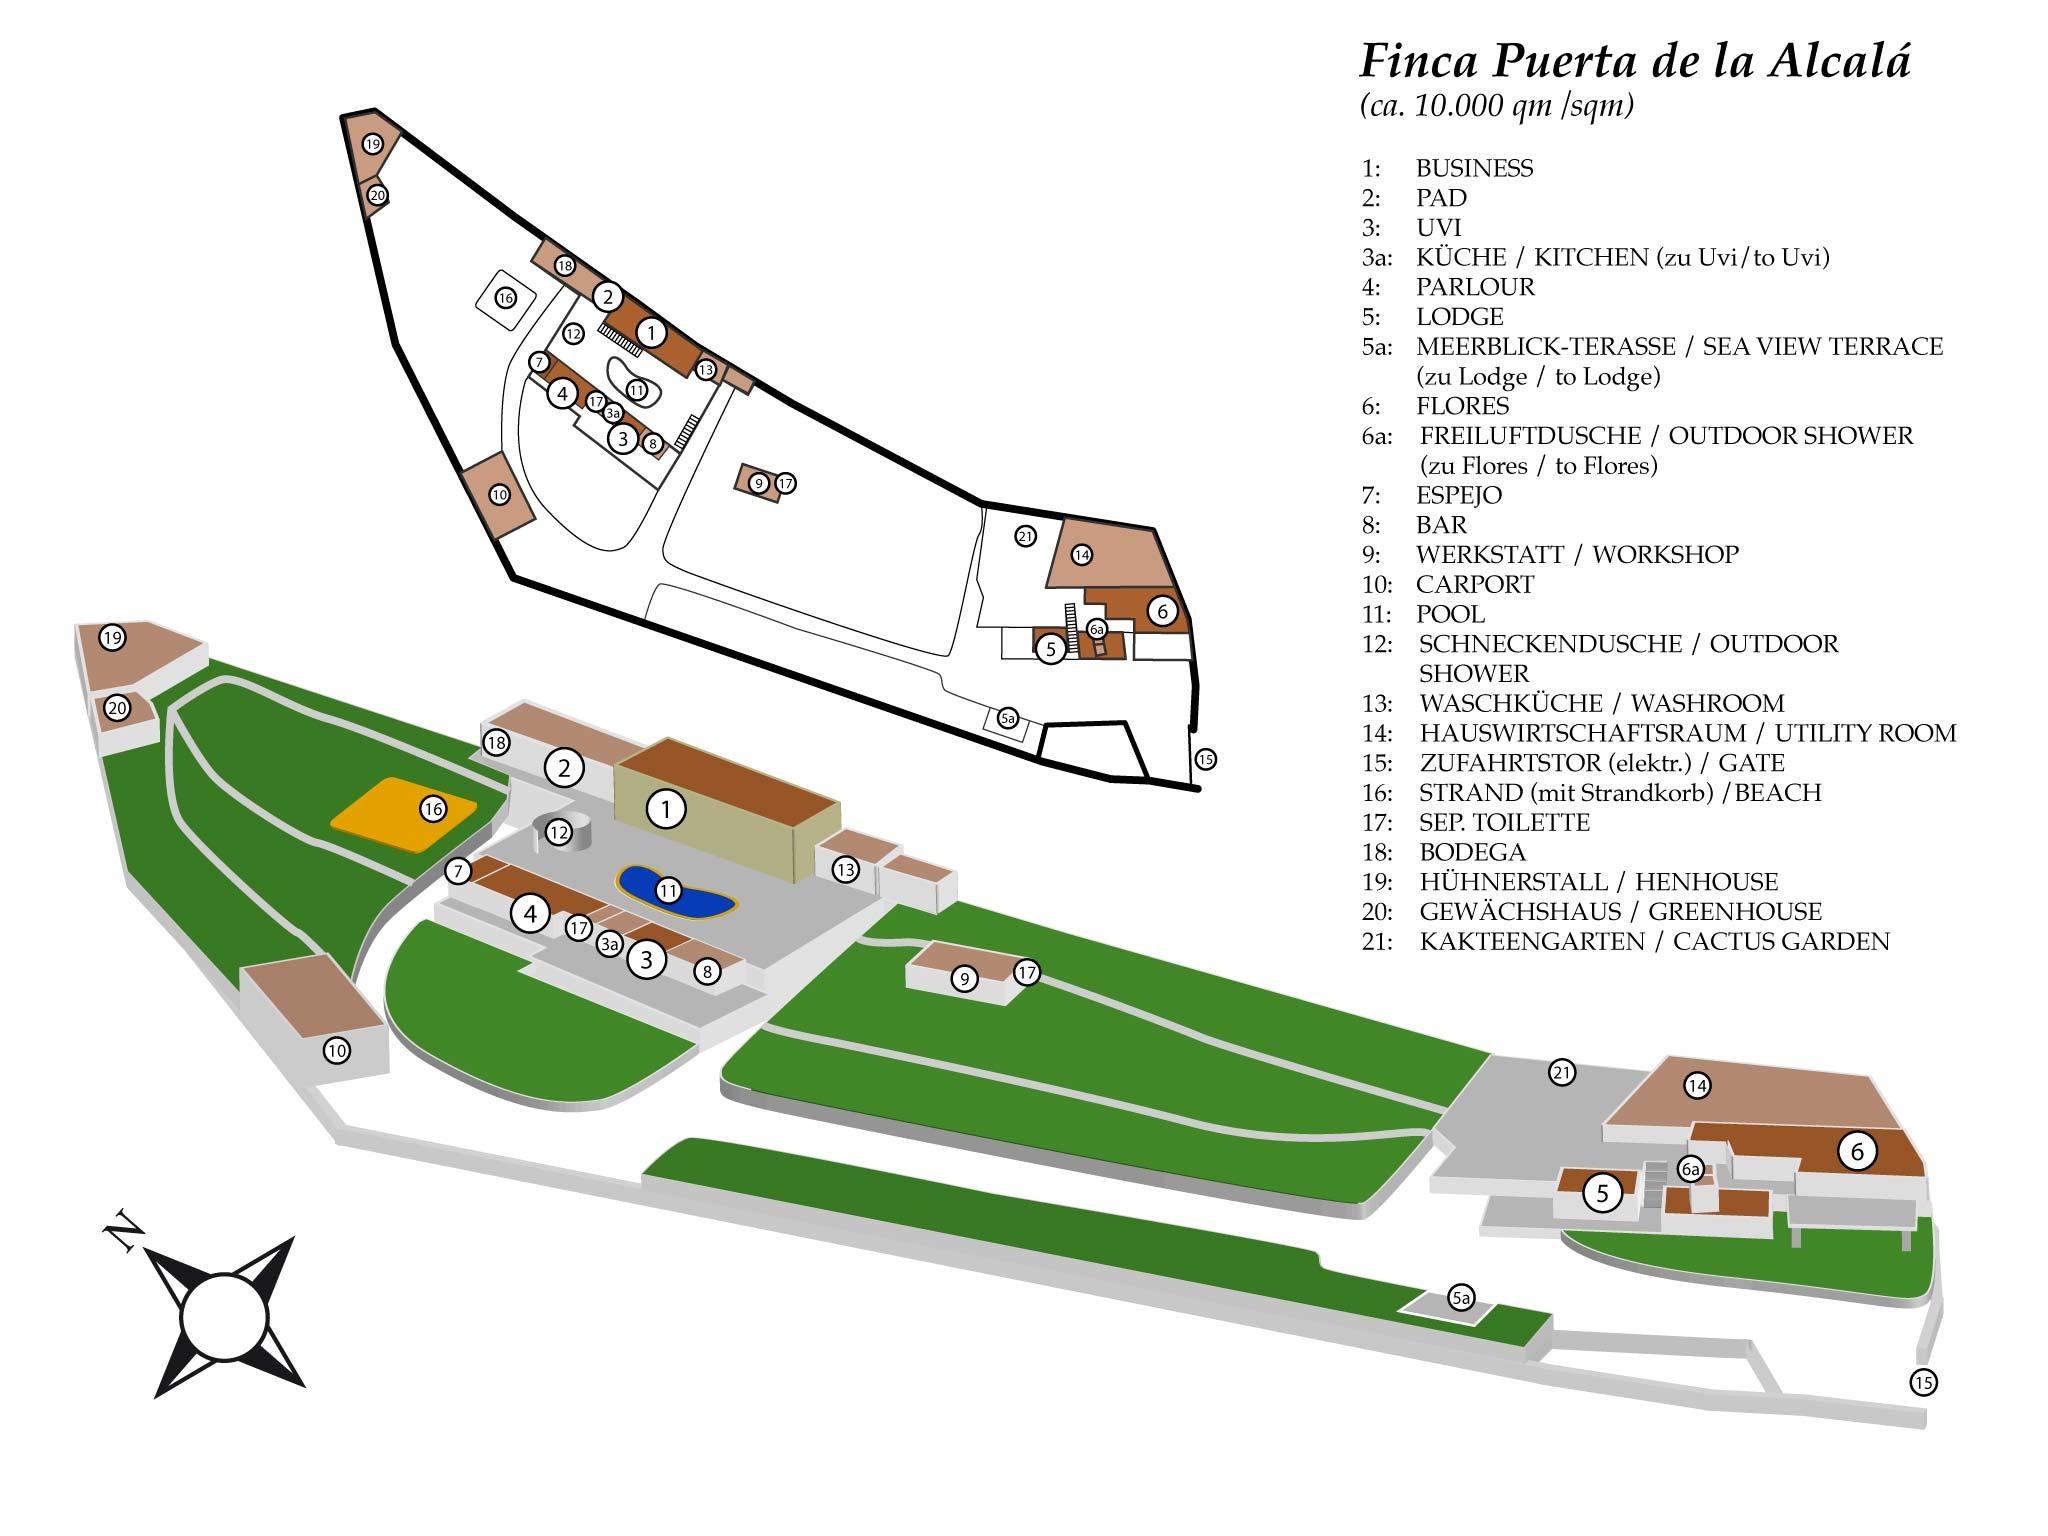 Maison de vacances Finca La Puerta de Alcalá ist eine privat geführte und gut gepflegte Ferienfinca (2379443), Alcala, Ténérife, Iles Canaries, Espagne, image 2